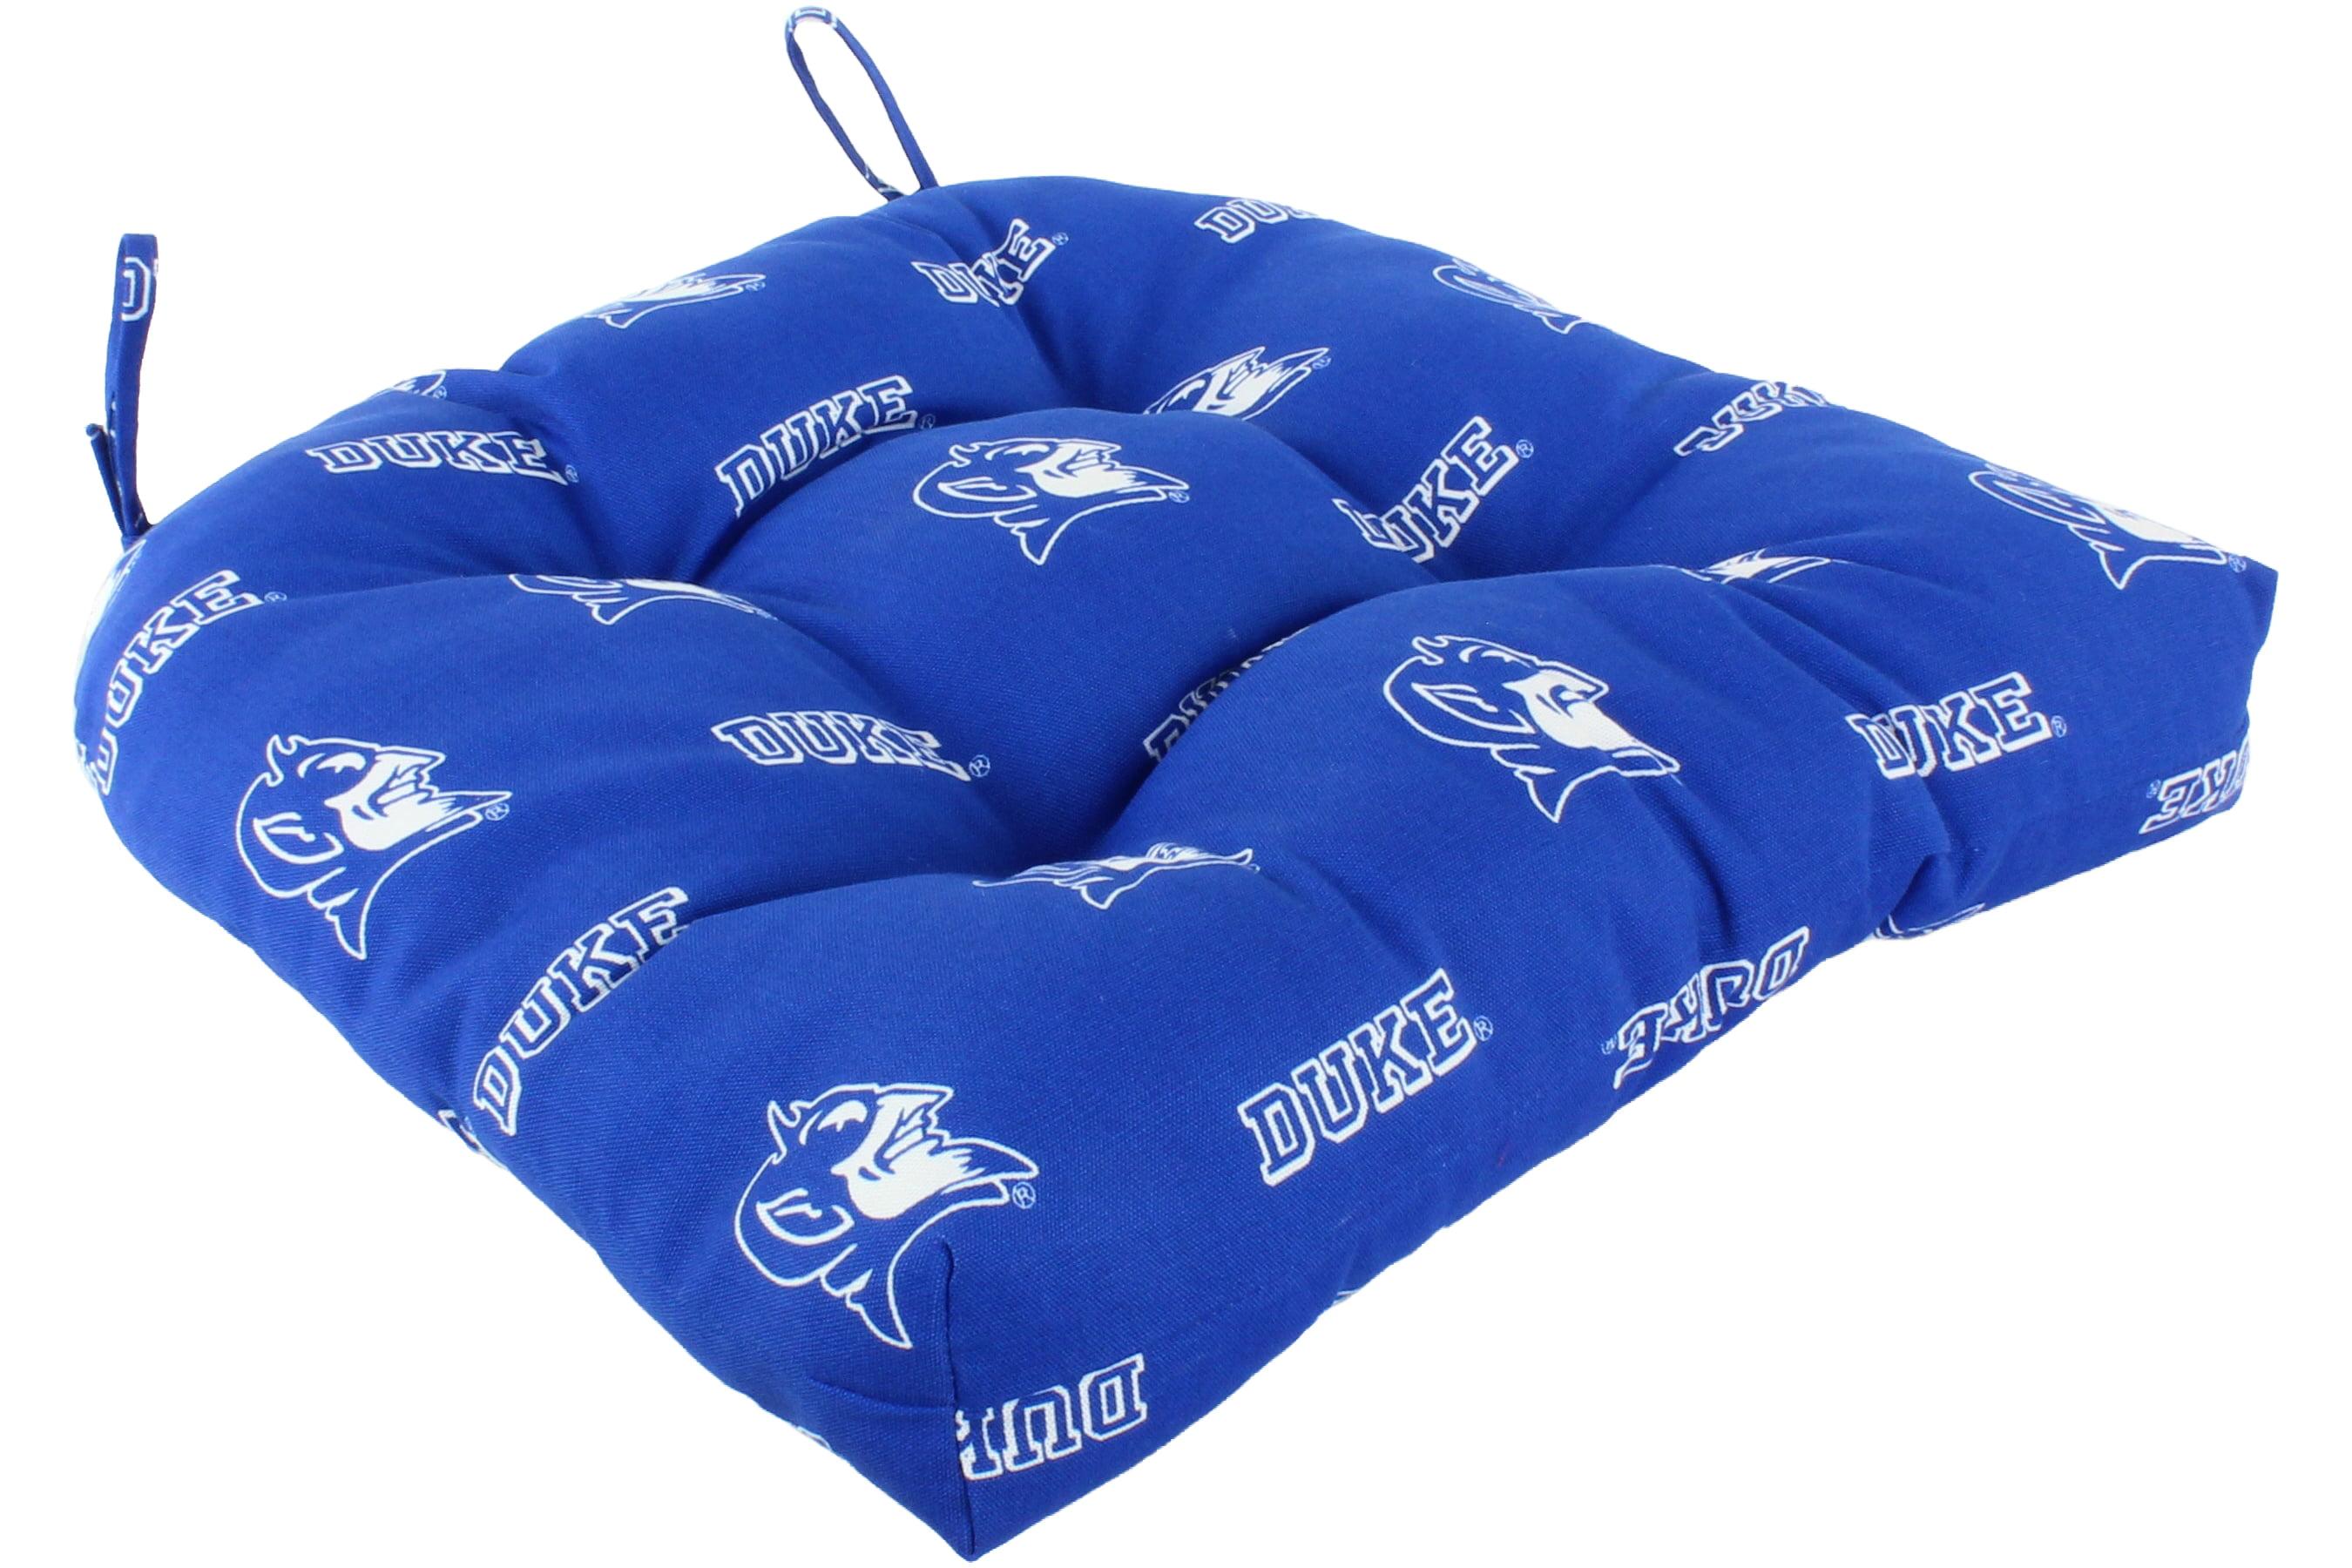 College Covers Duke Blue Devils Indoor Outdoor Seat Cushion Patio D Cushion 20 X 20 2 Tie Backs Walmart Com Walmart Com